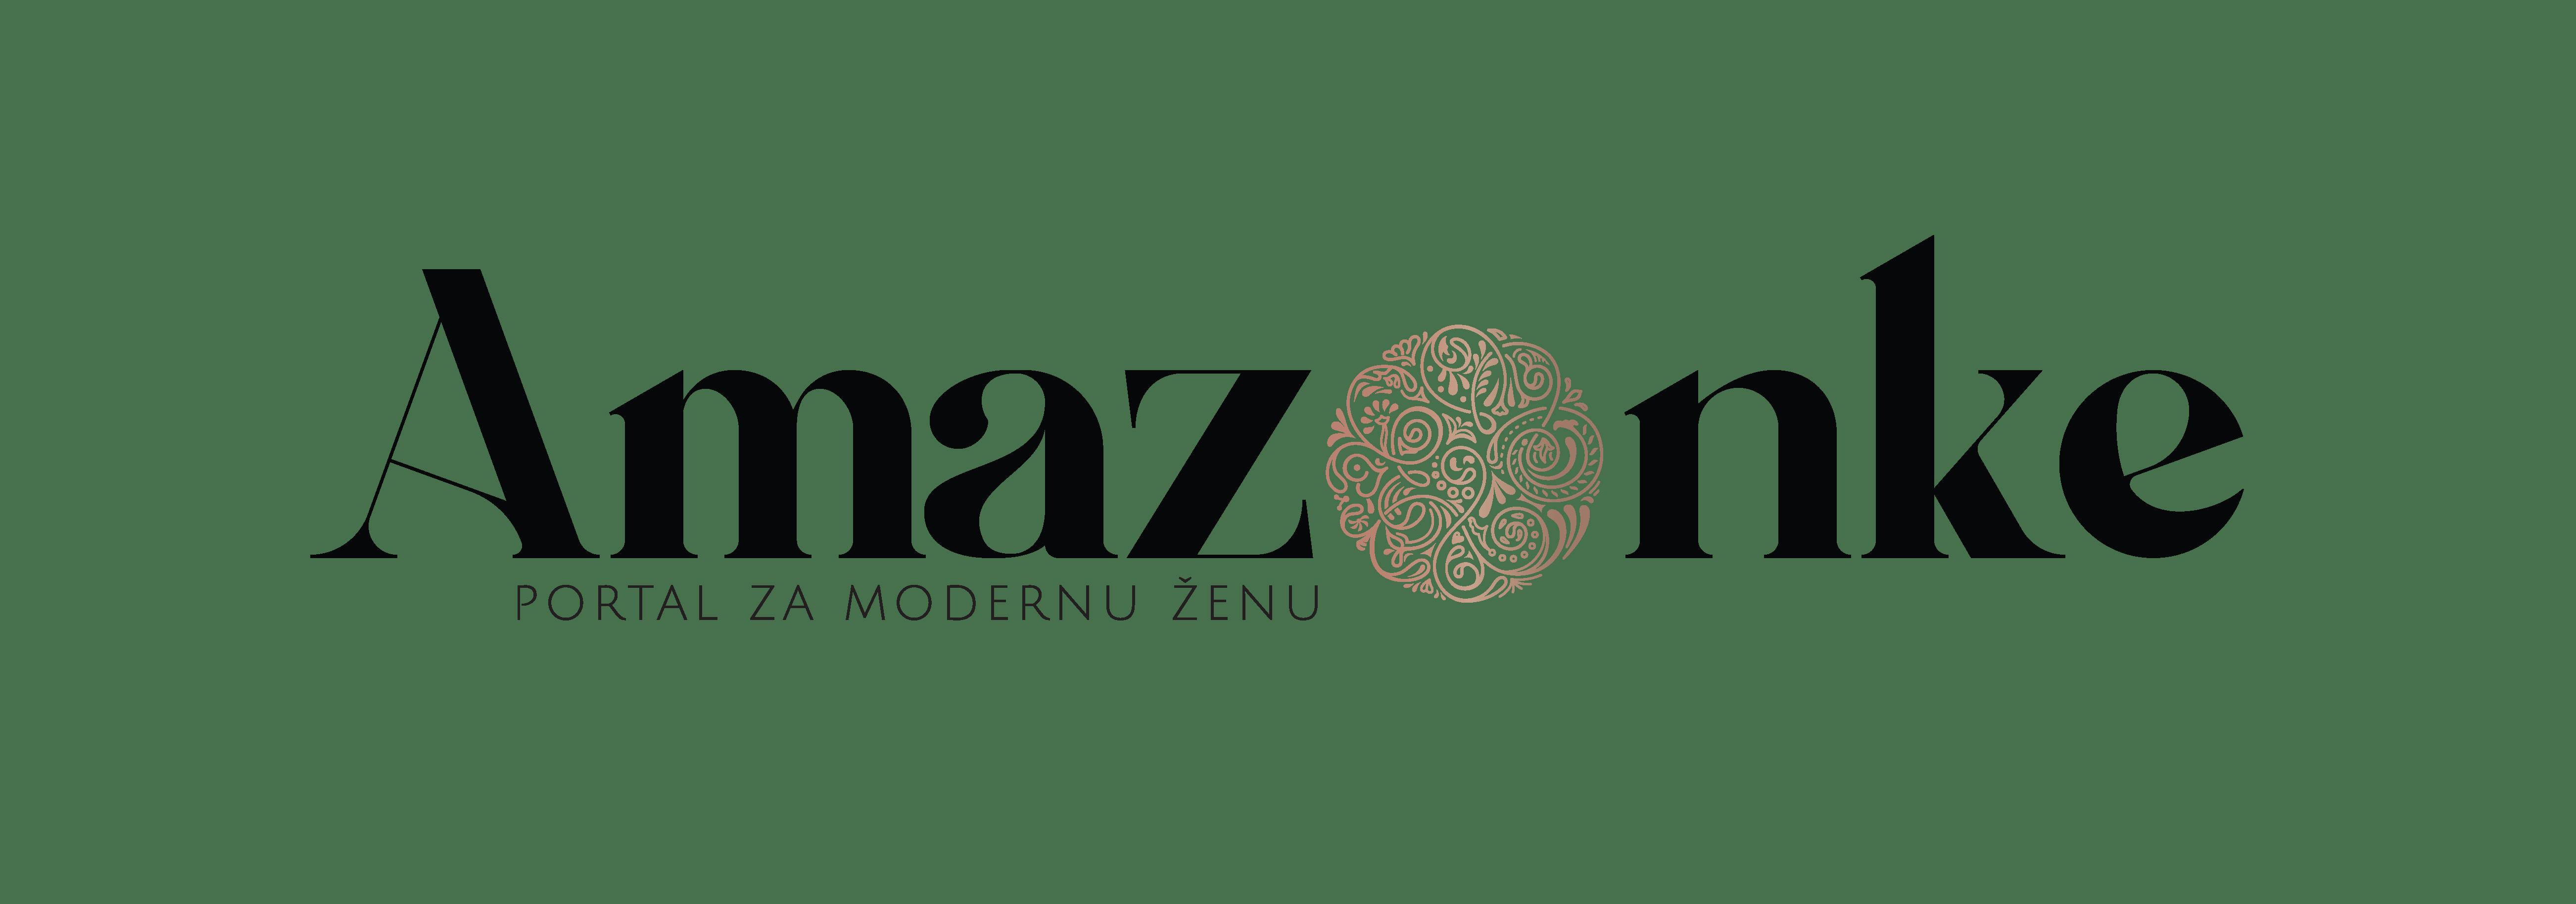 Amazonke.com